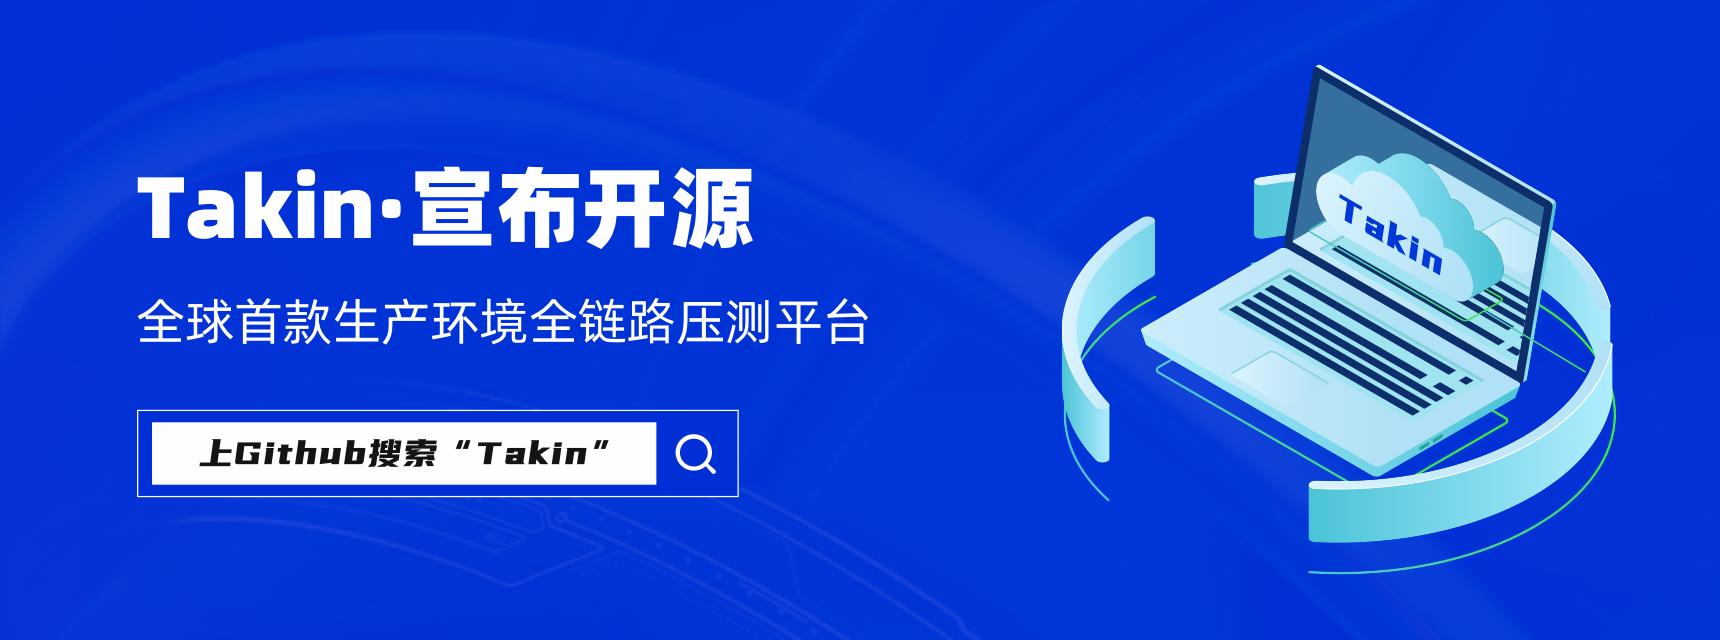 Takin宣布开源